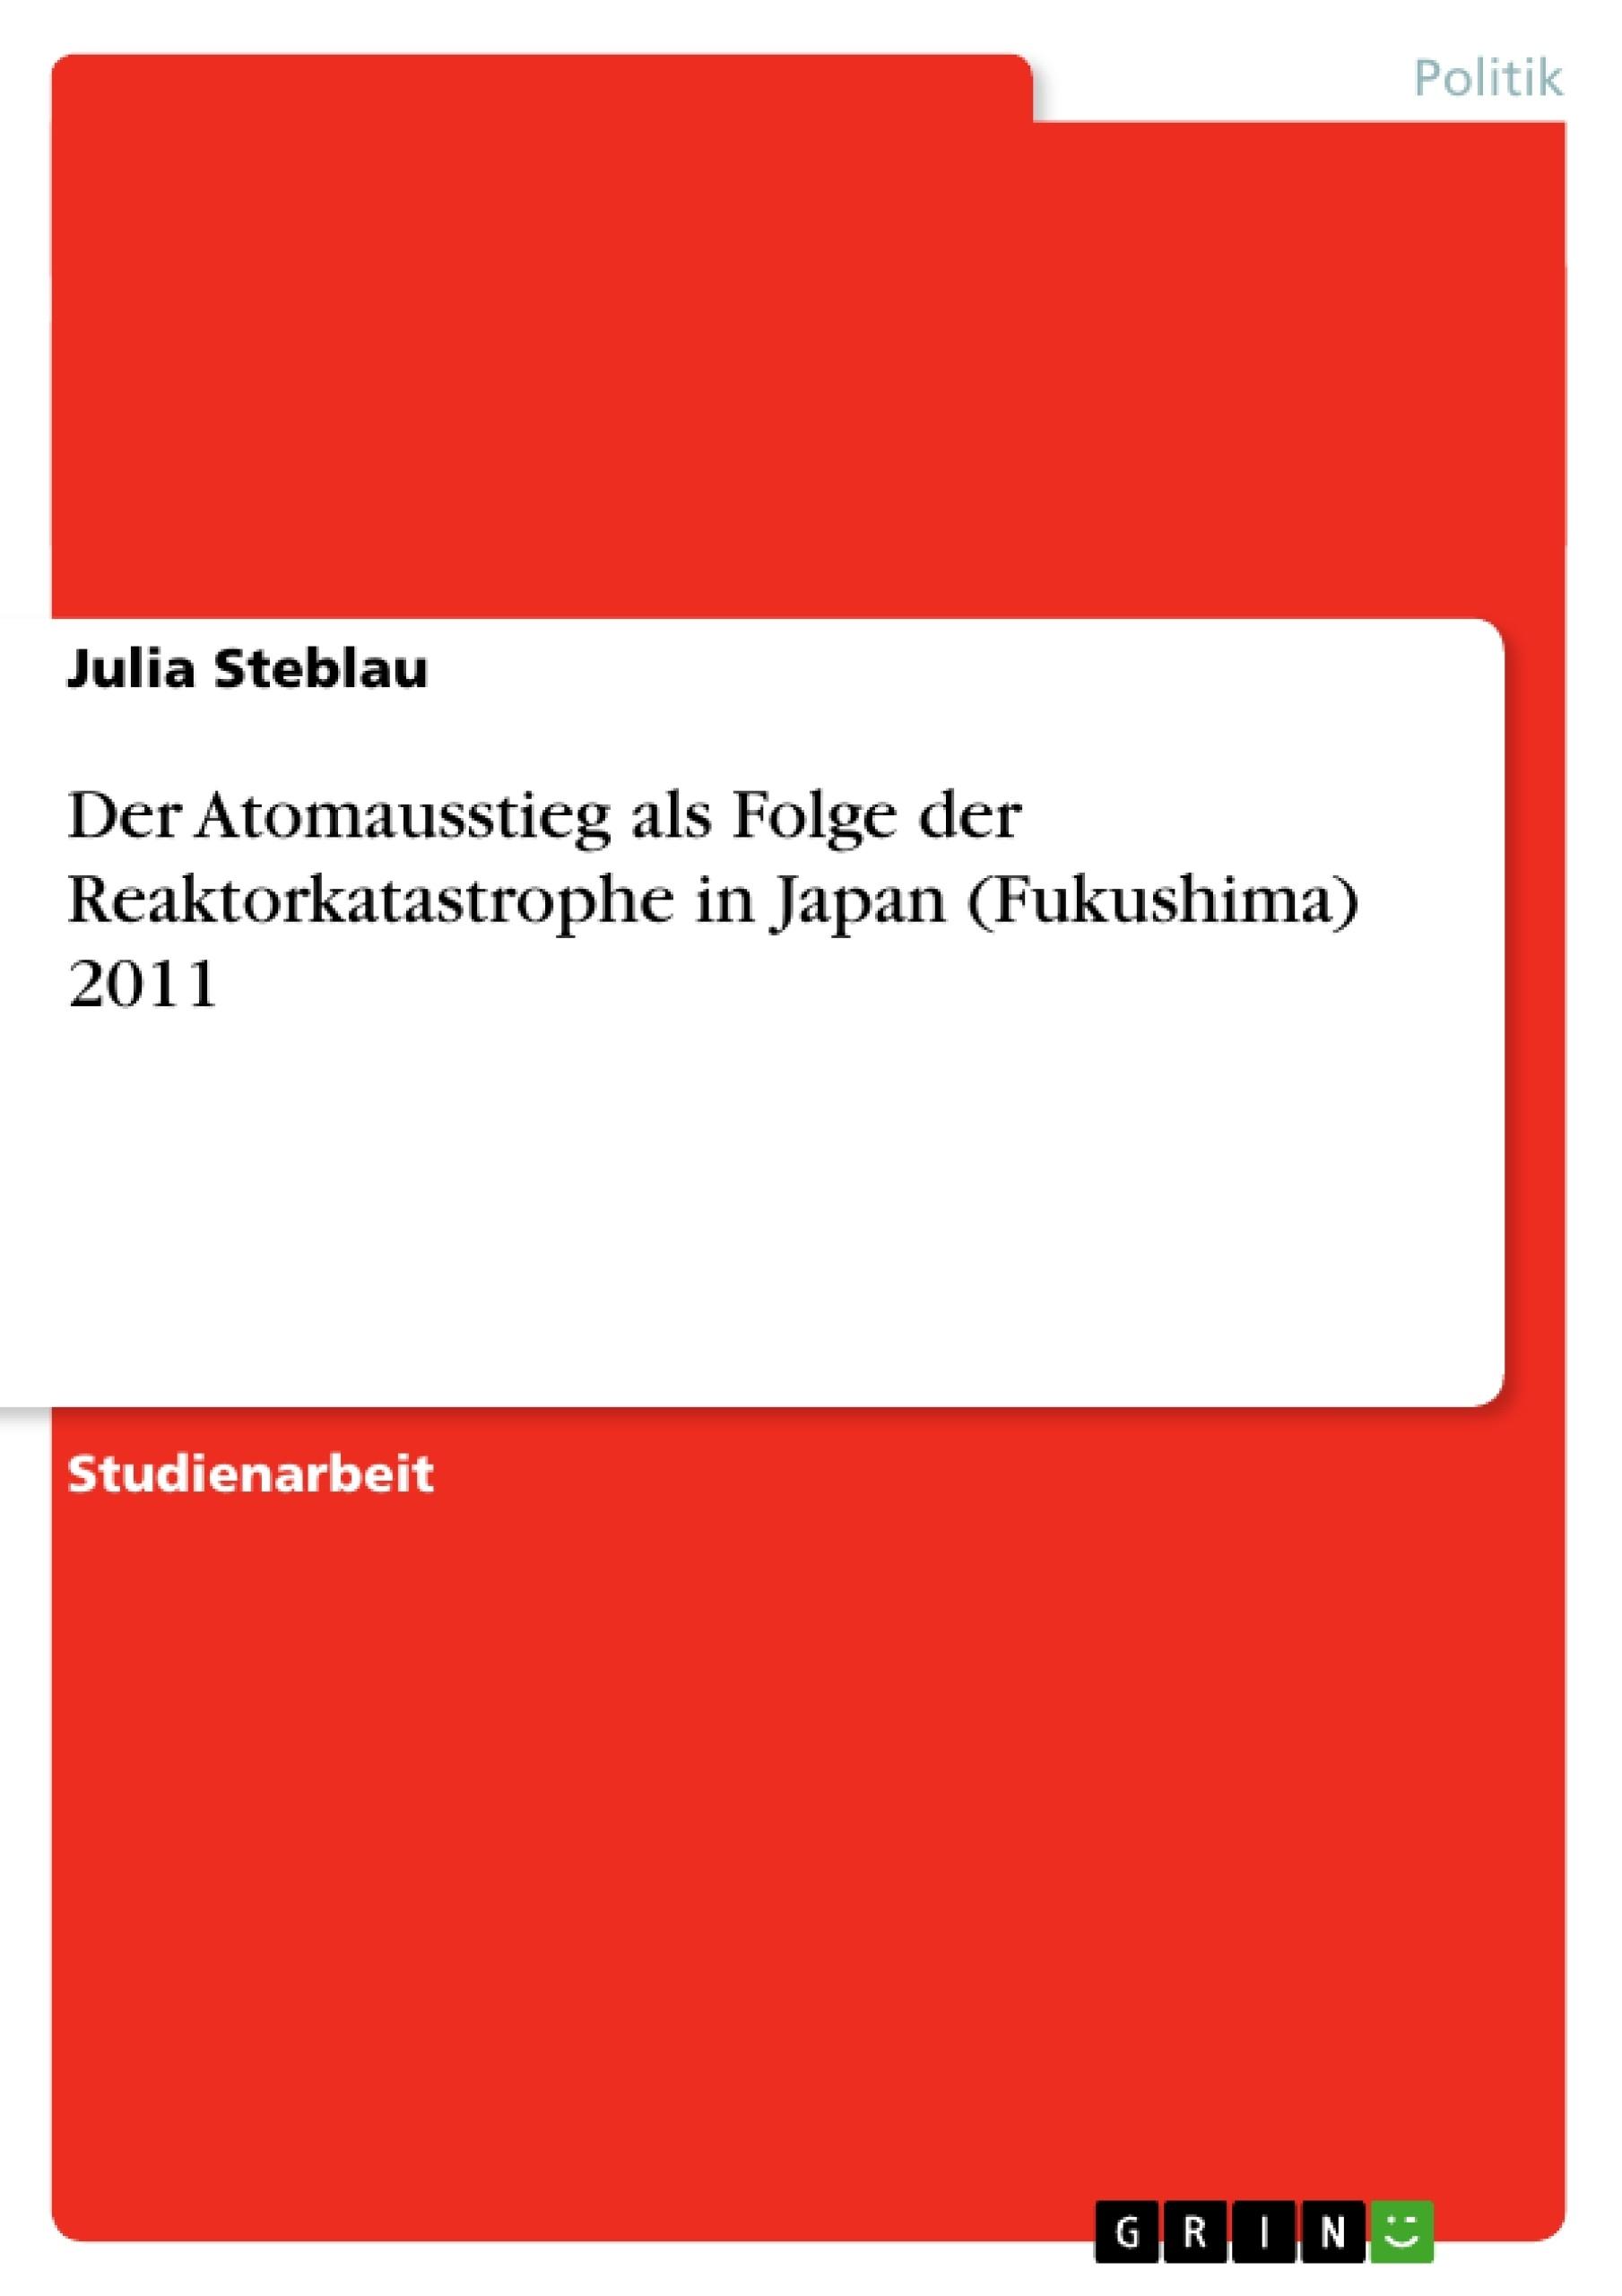 Titel: Der Atomausstieg als Folge der Reaktorkatastrophe in Japan (Fukushima) 2011